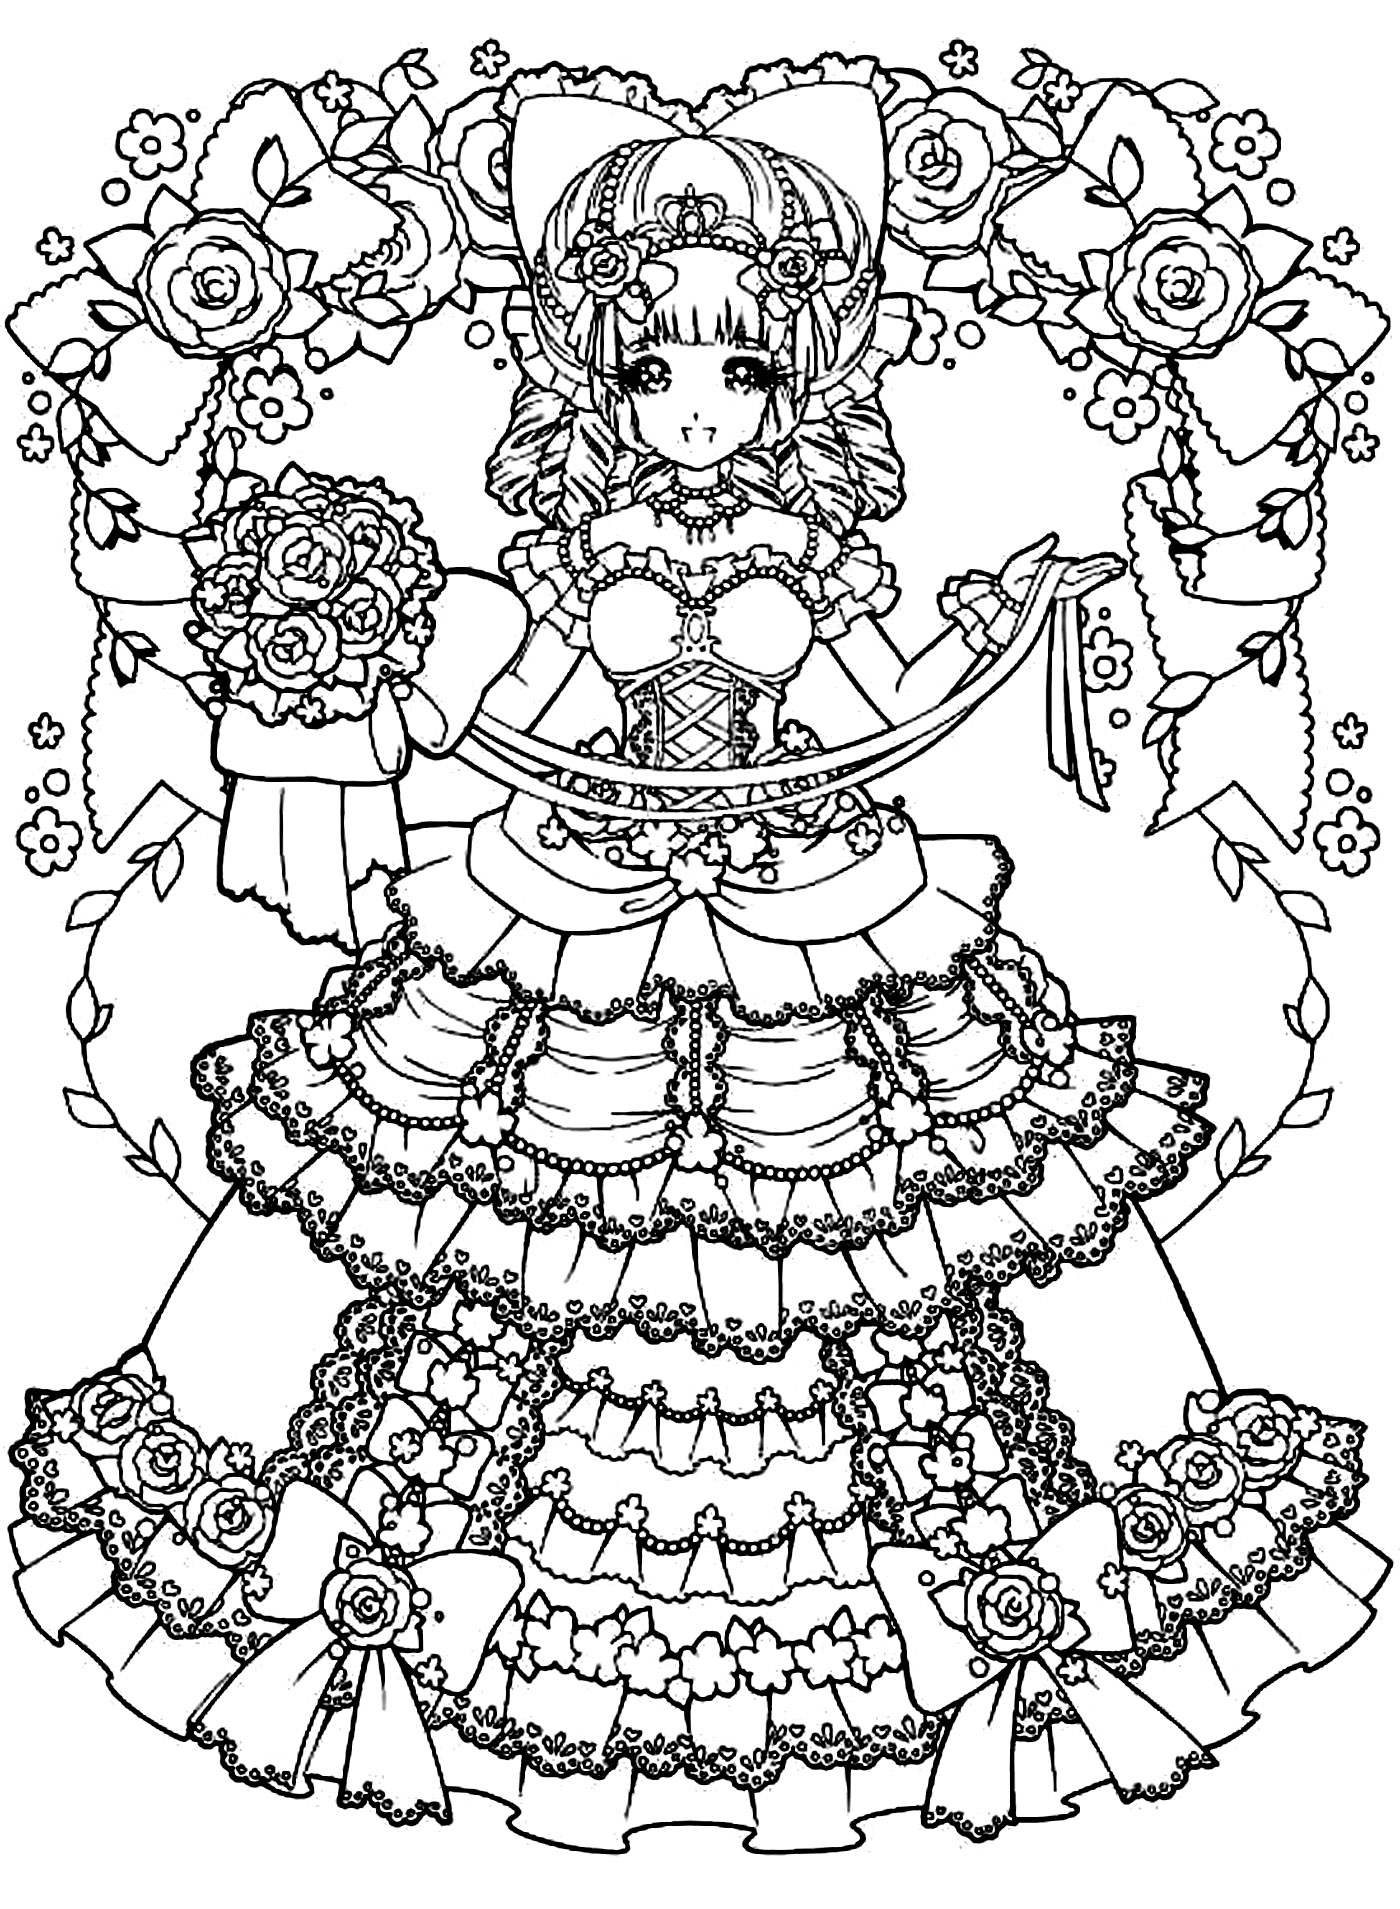 Colorear para adultos : Mangas - 10